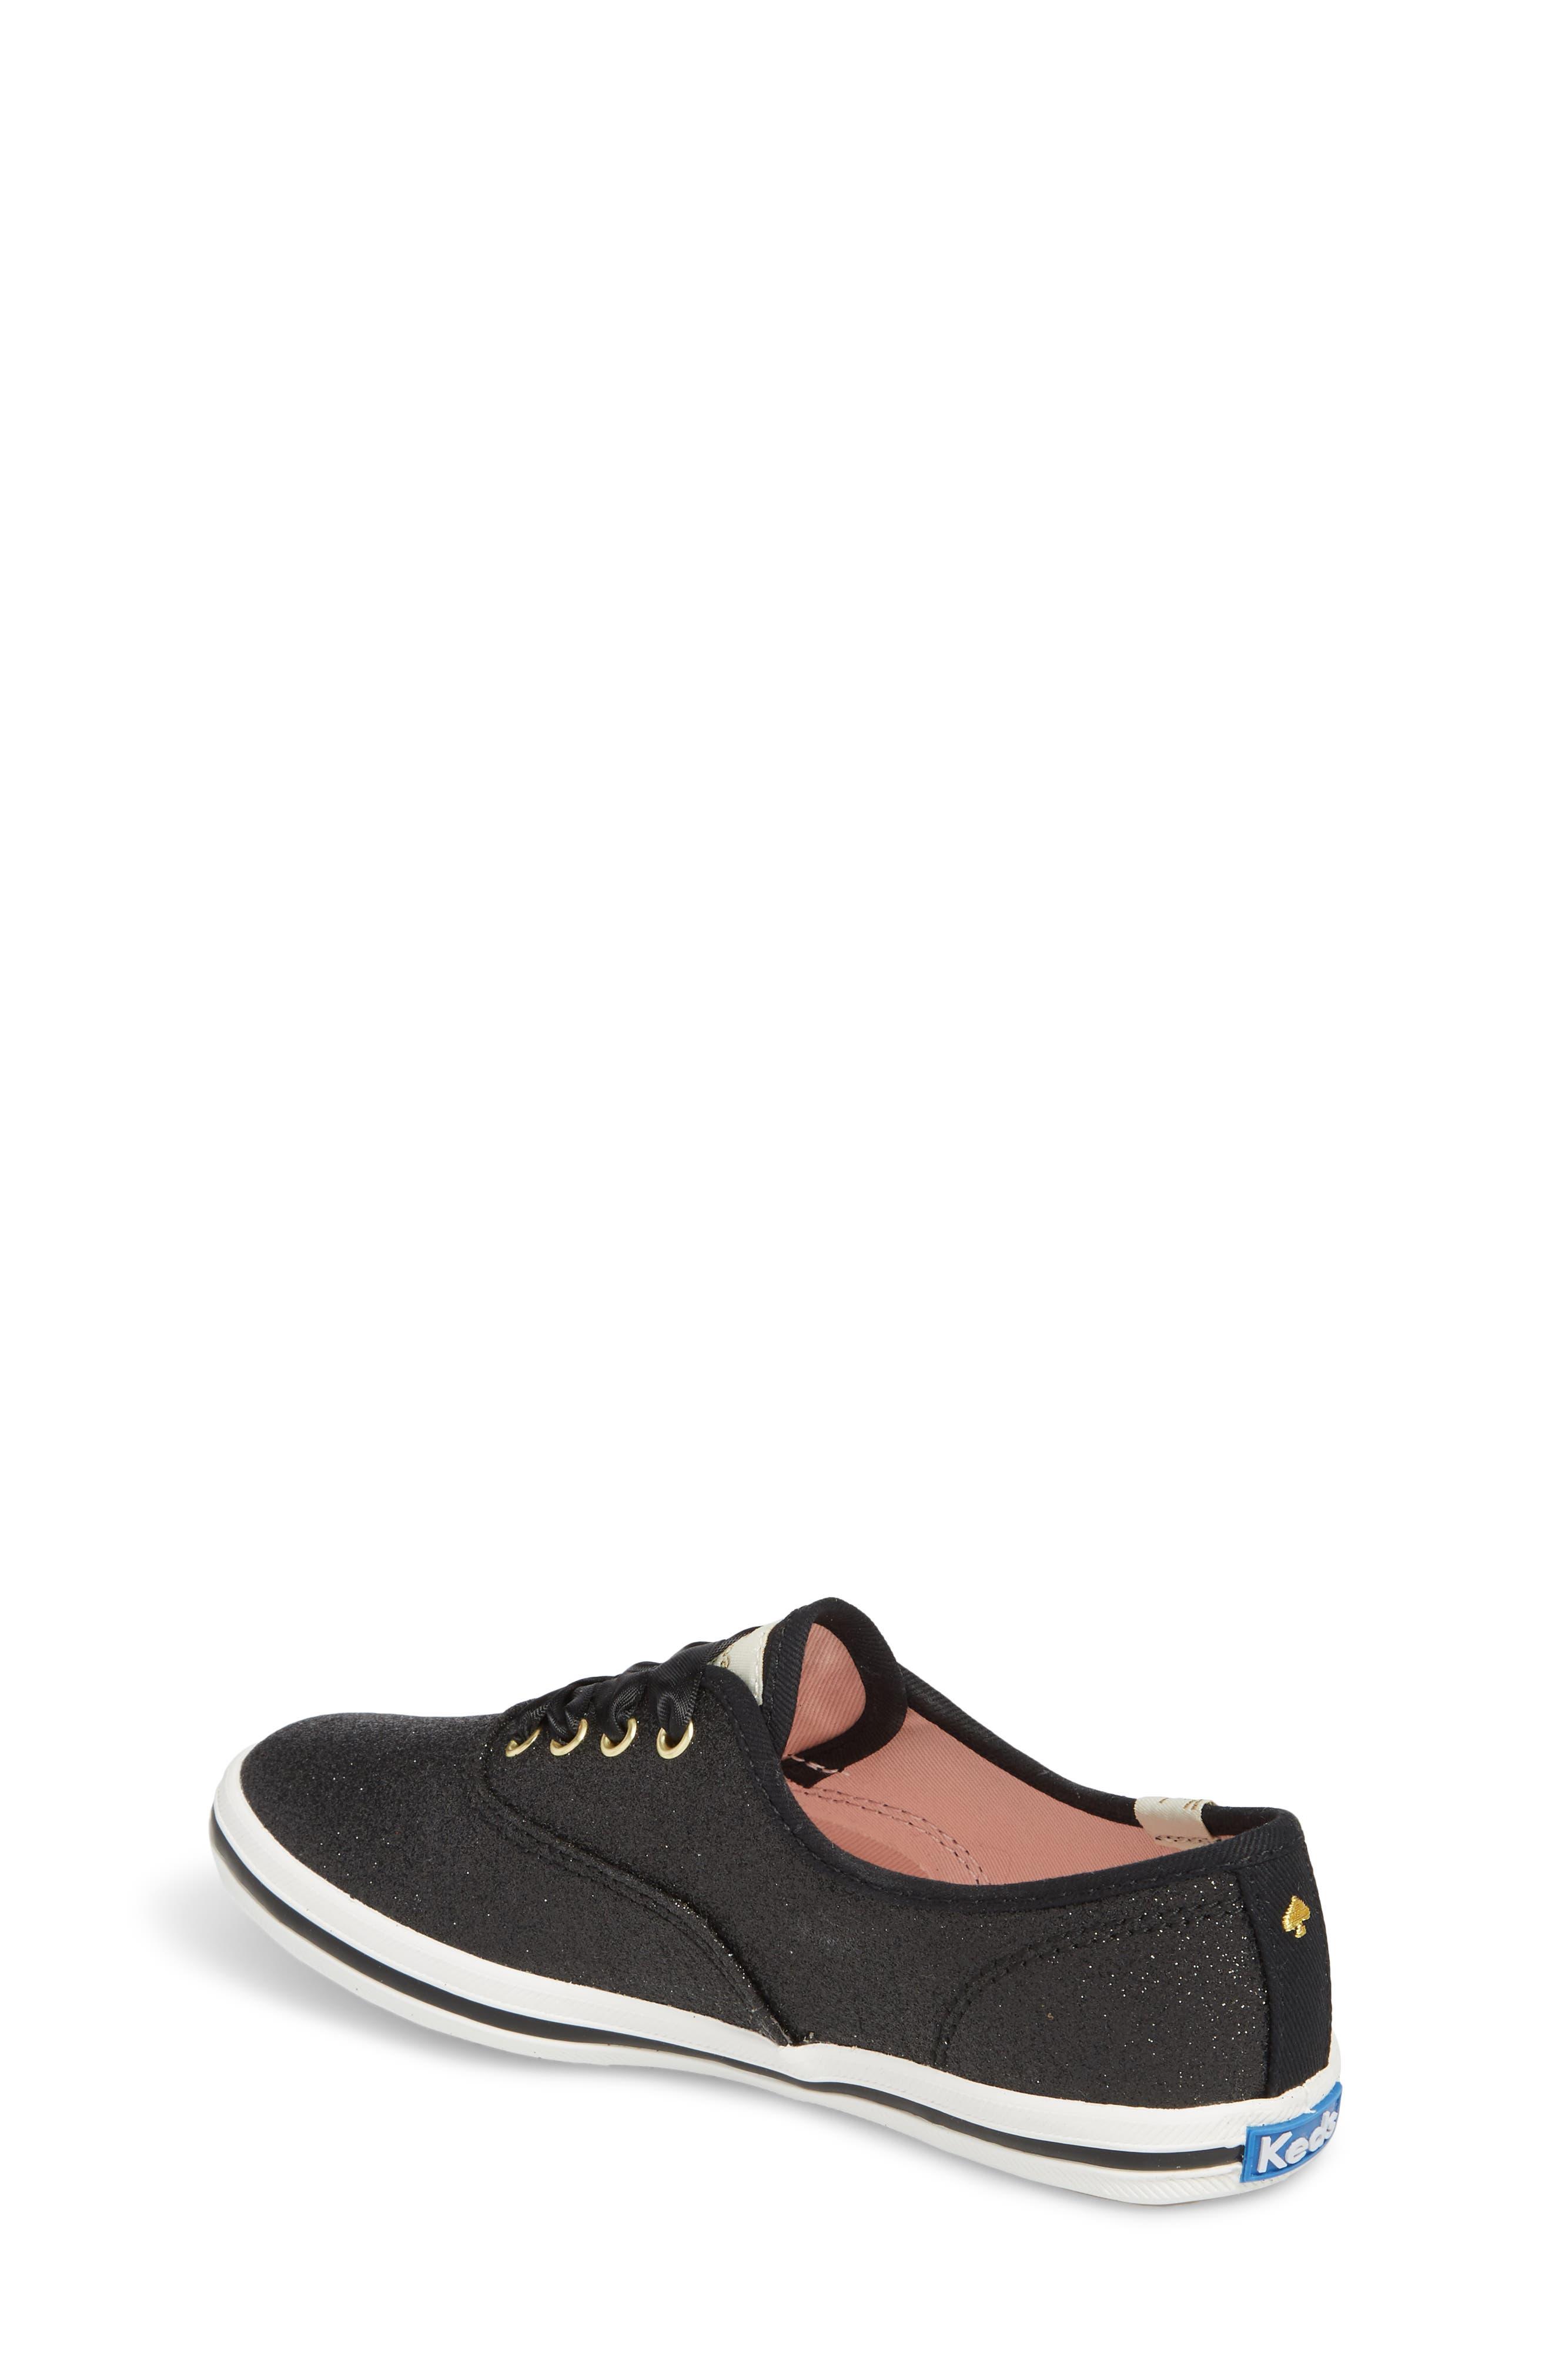 x kate spade new york Champion Glitter Sneaker,                             Alternate thumbnail 2, color,                             Black